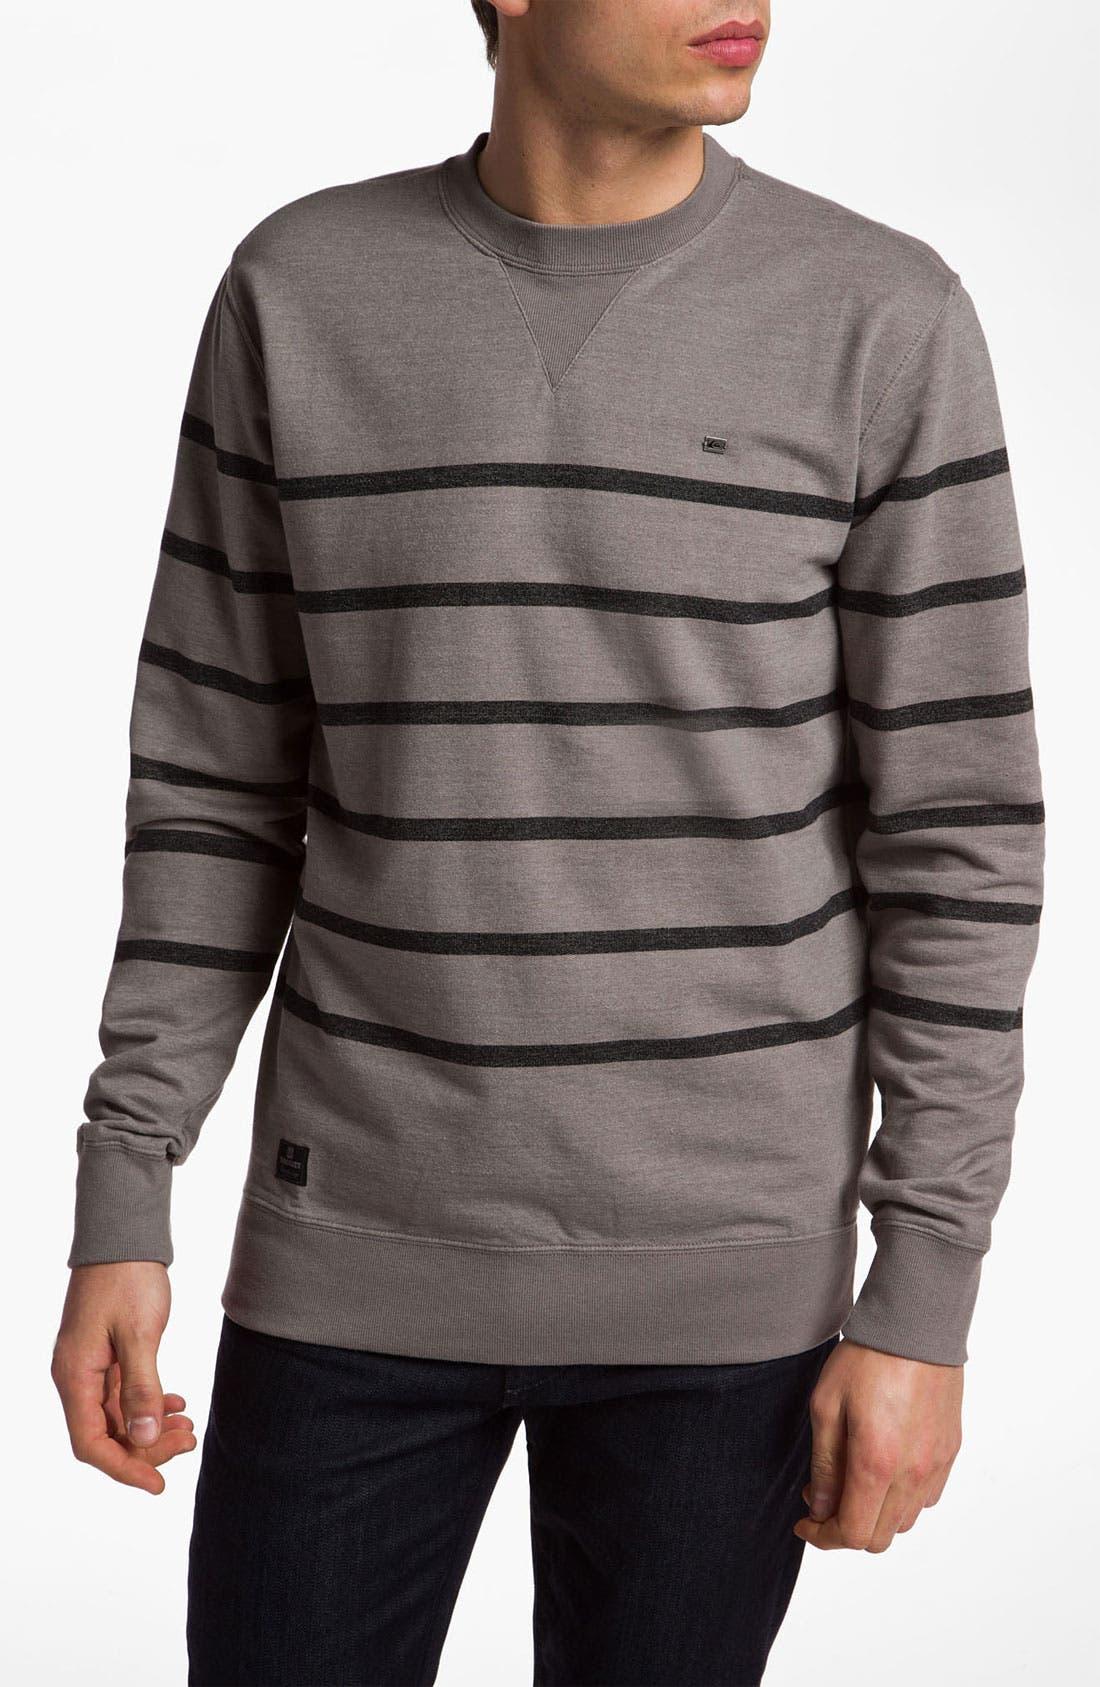 Main Image - Quiksilver 'Malone' Crewneck Sweatshirt